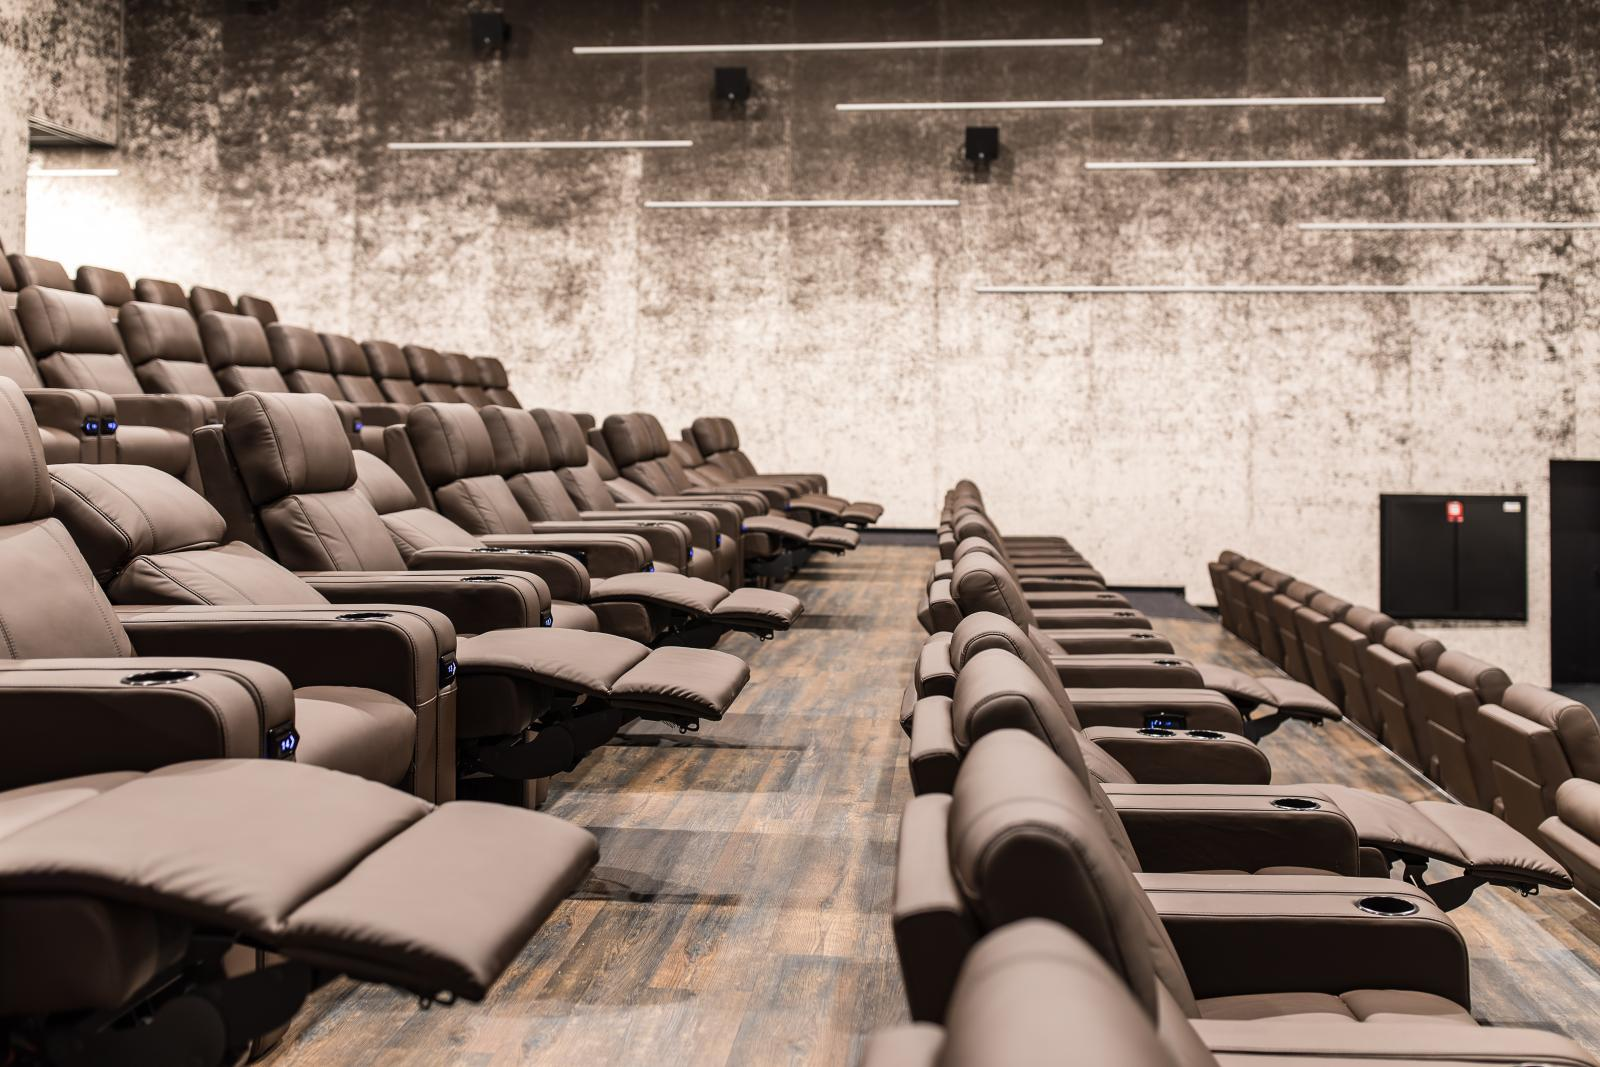 Cinedom Programm